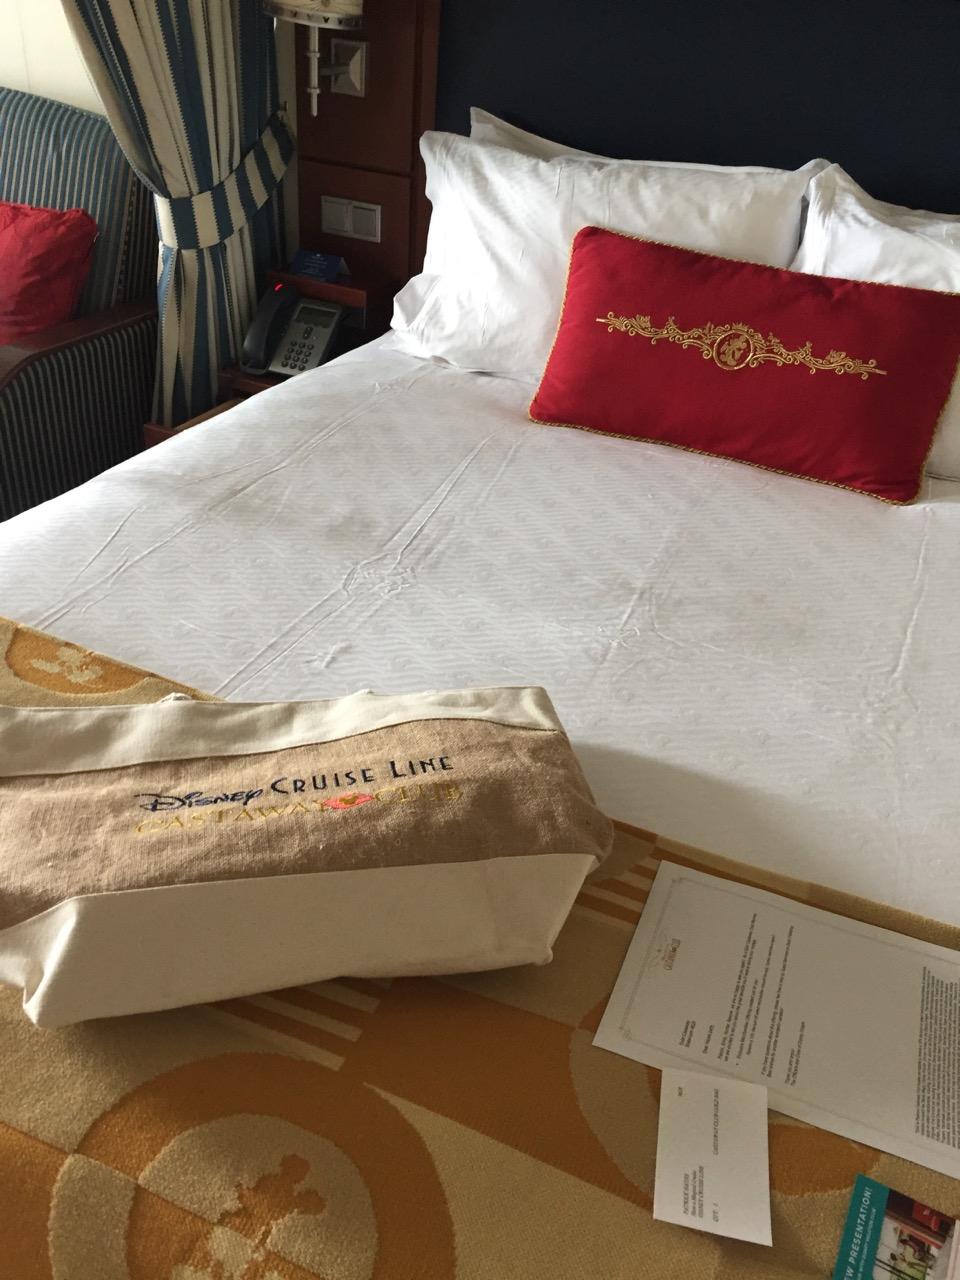 Disney Cruise Line Godl Castaway Bag